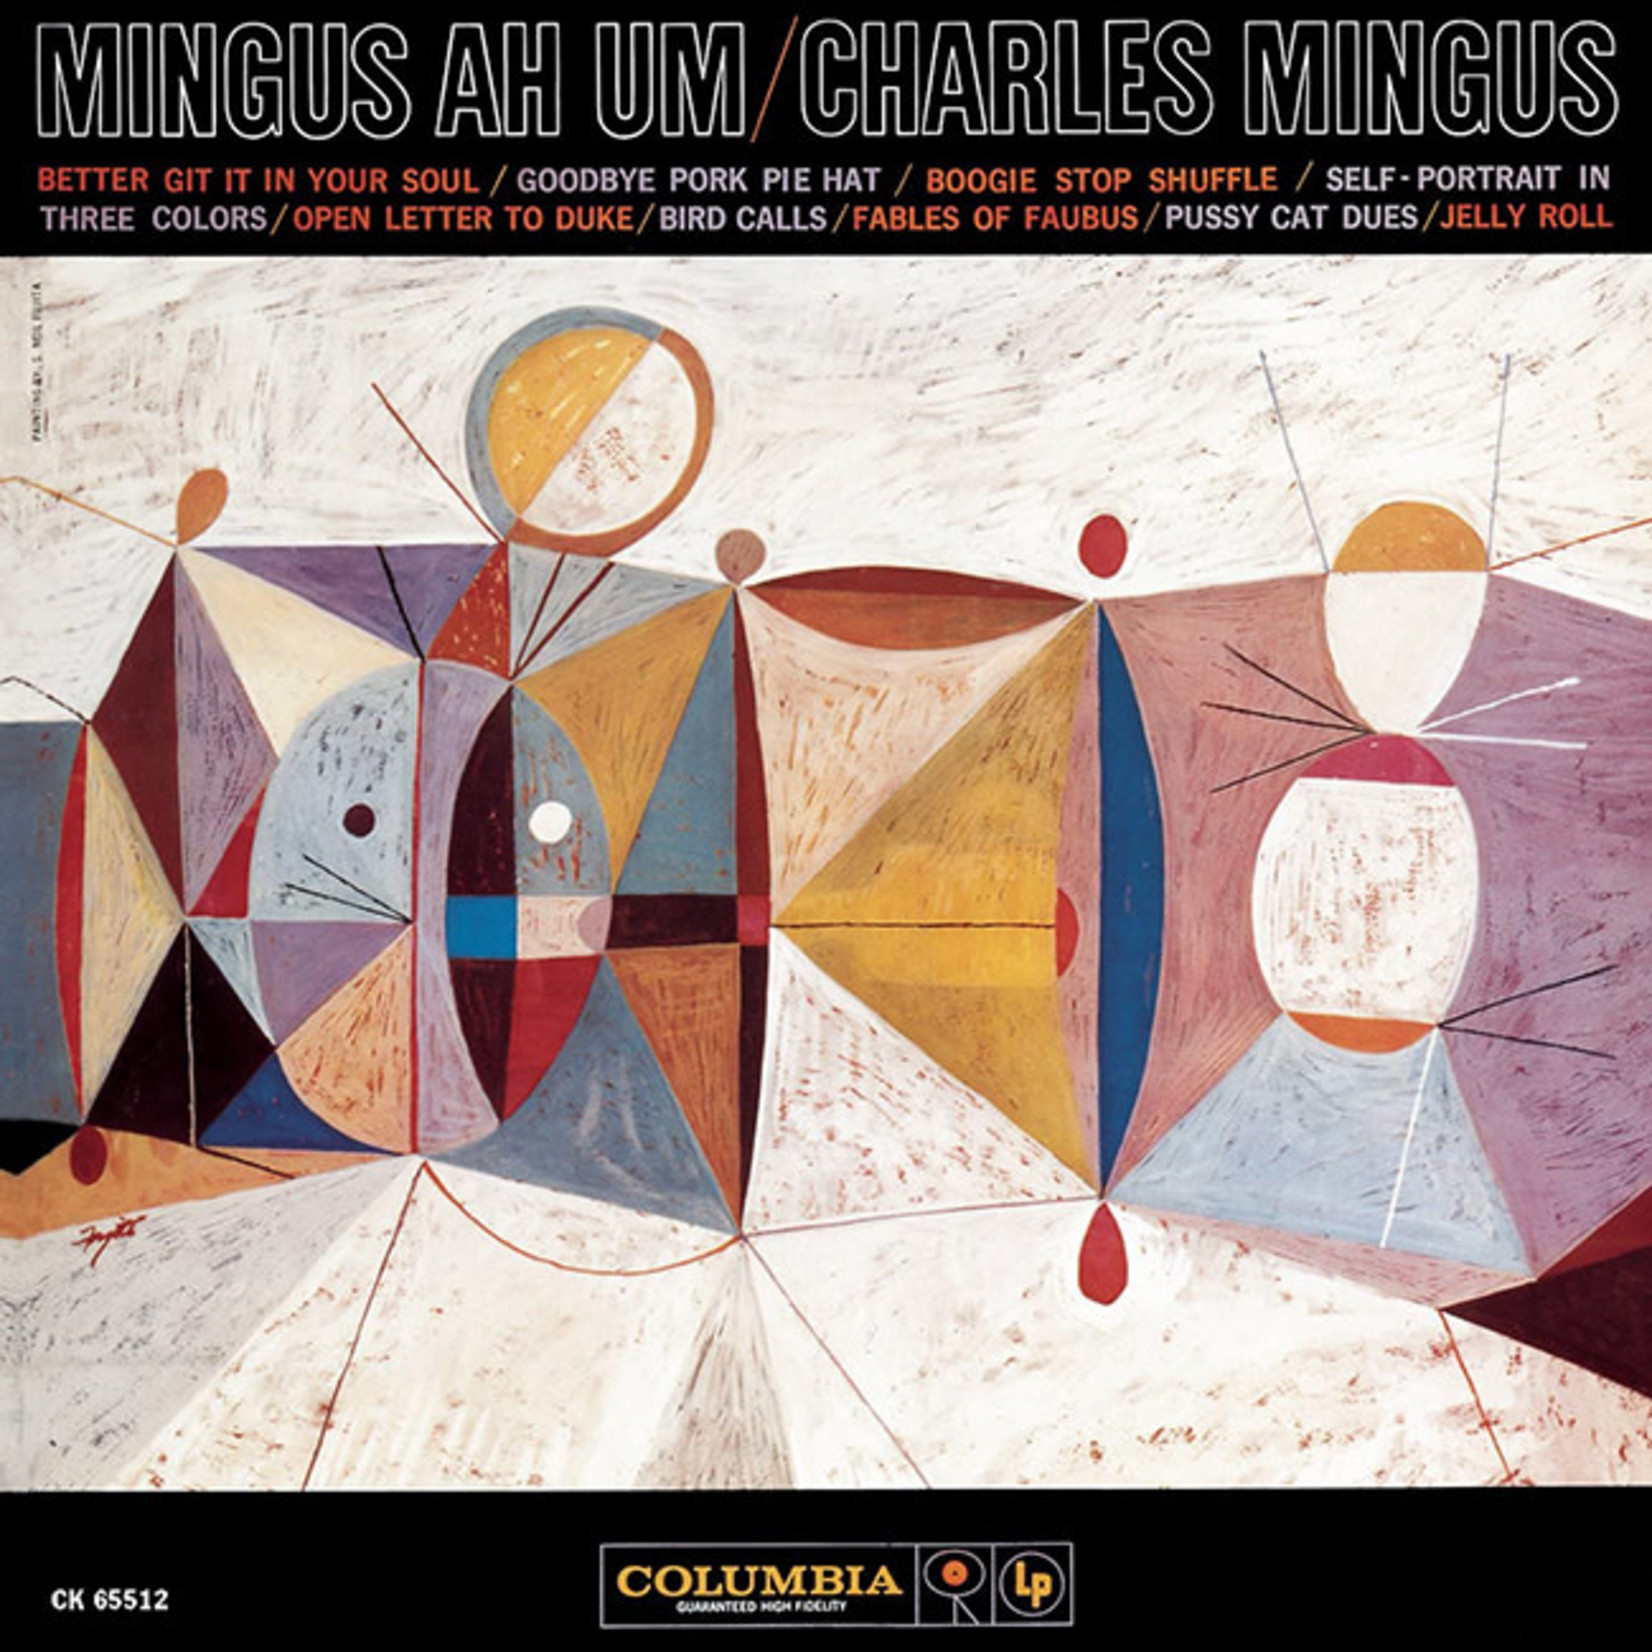 [New] Mingus, Charles: Mingus Ah Um